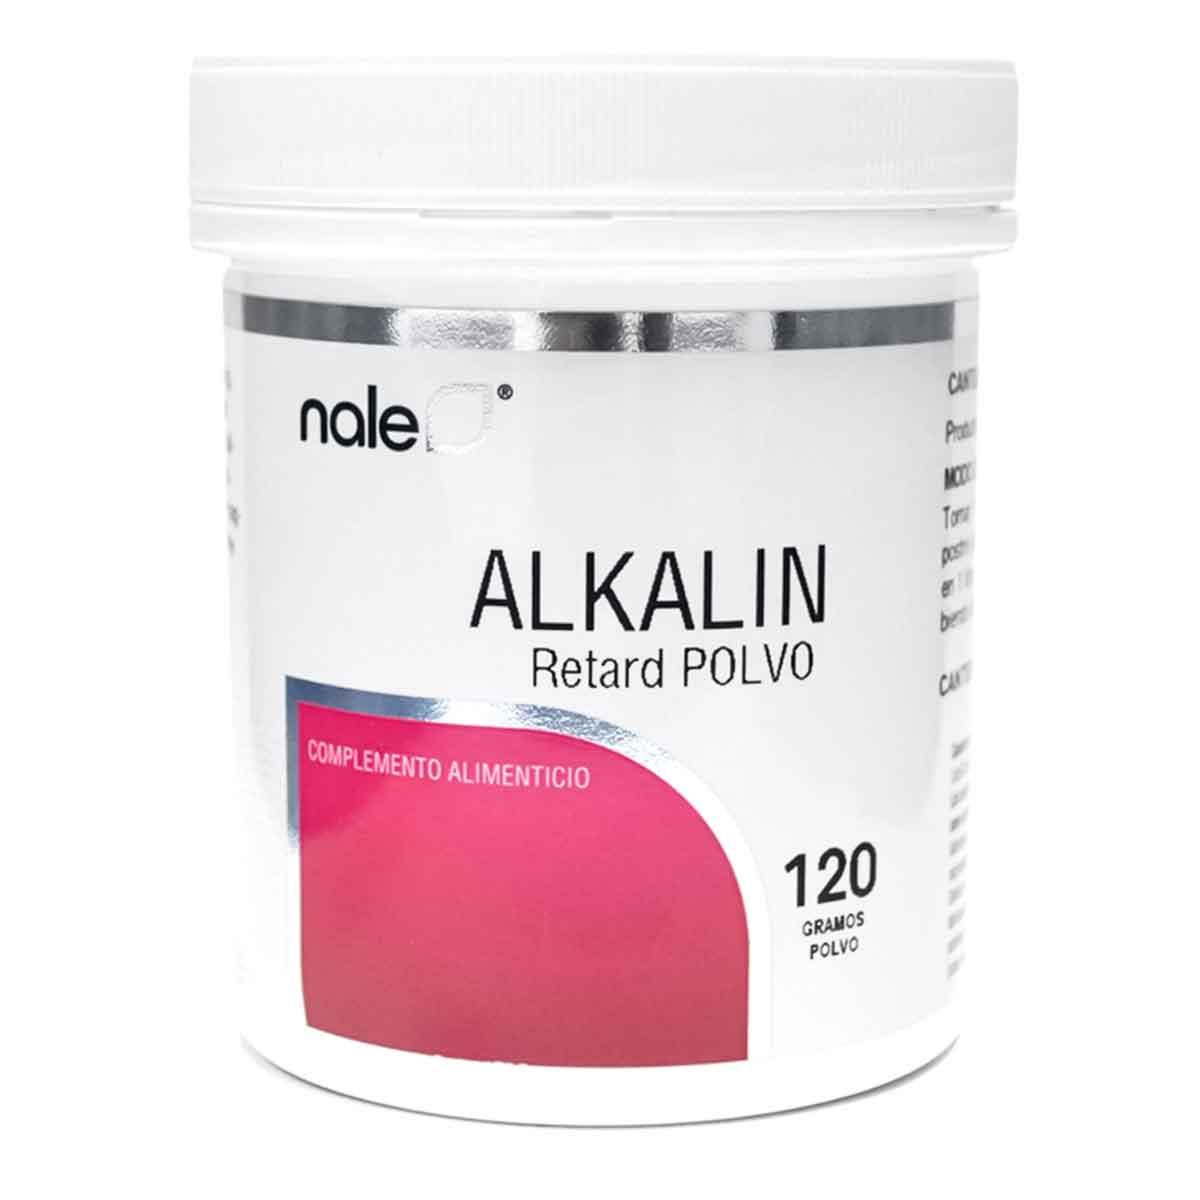 Alkalin Retard Polvo Nale 120 gr